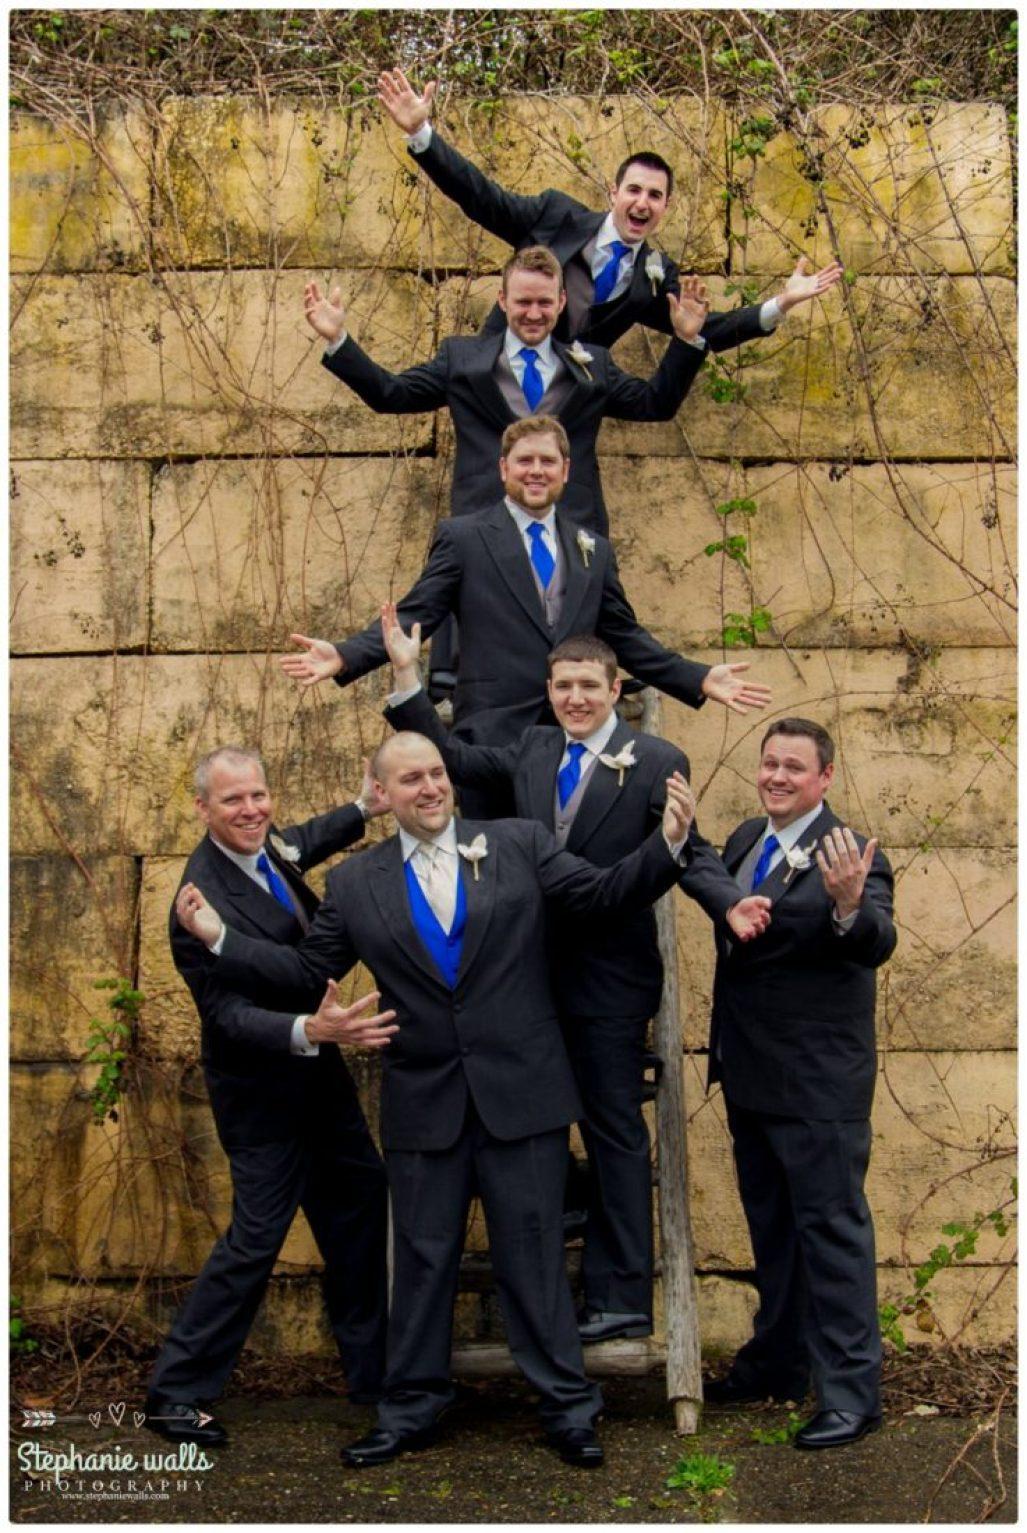 2016 03 24 0040 Racing Love   Snohomish Event Center   Snohomish Wedding Photographer